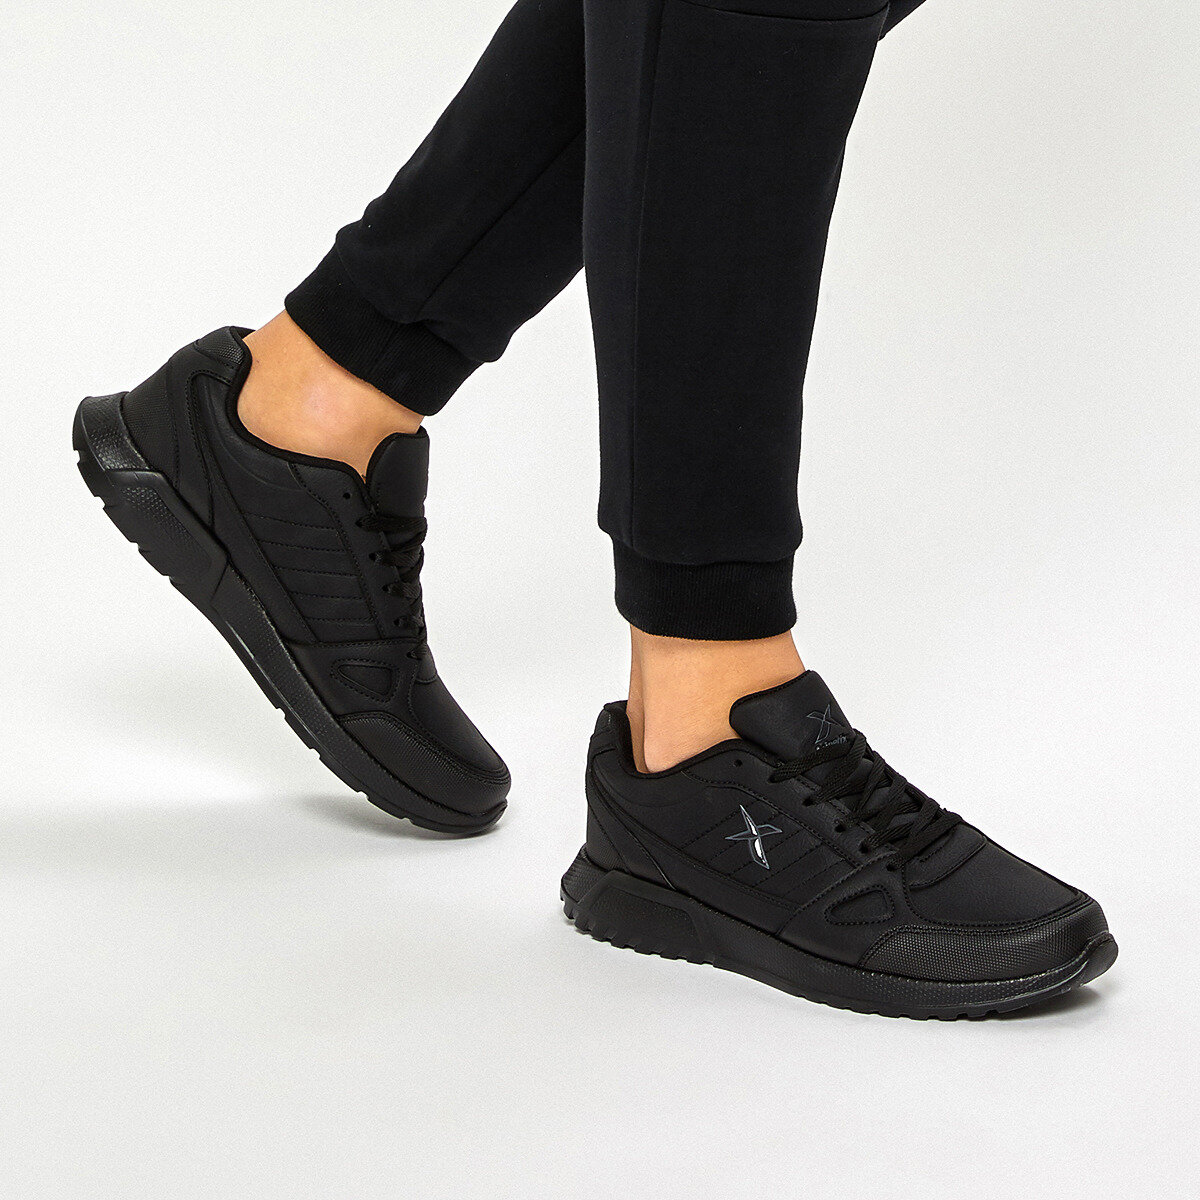 FLO GORDEN M 9PR Black Men 'S Sneaker Shoes KINETIX